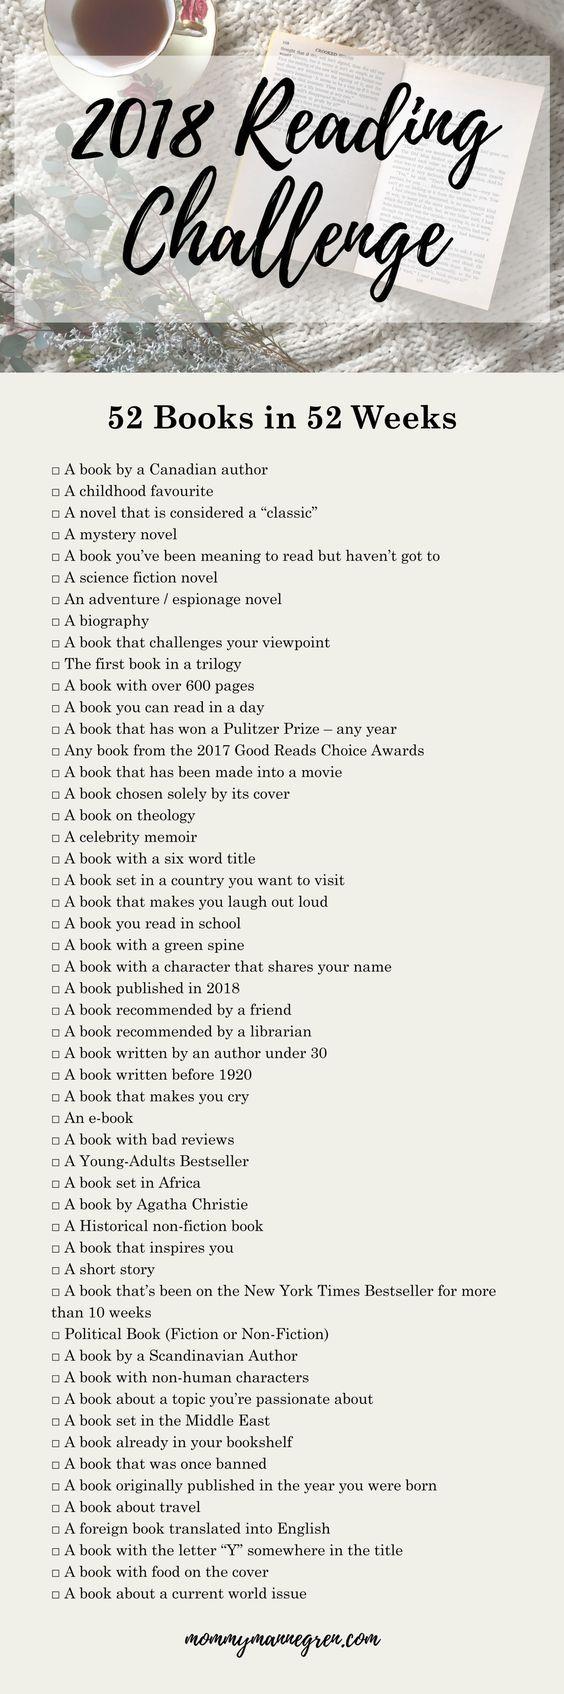 2018 Reading Challenge + FREE PRINTABLE